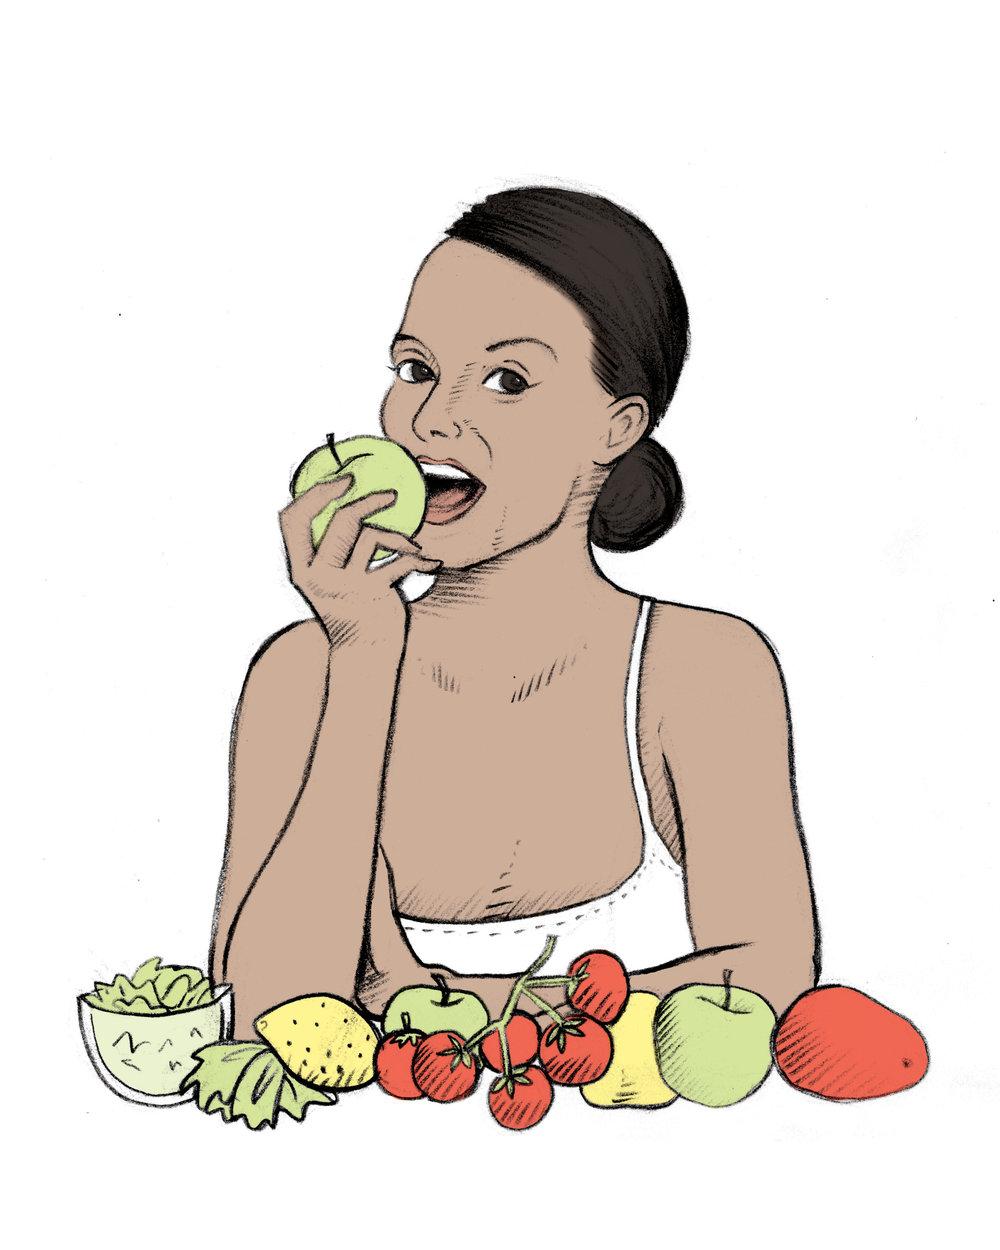 FASD_AWARENESS_ILLUSTRATIONS-WOMAN_EATING_HEALTHY.jpg